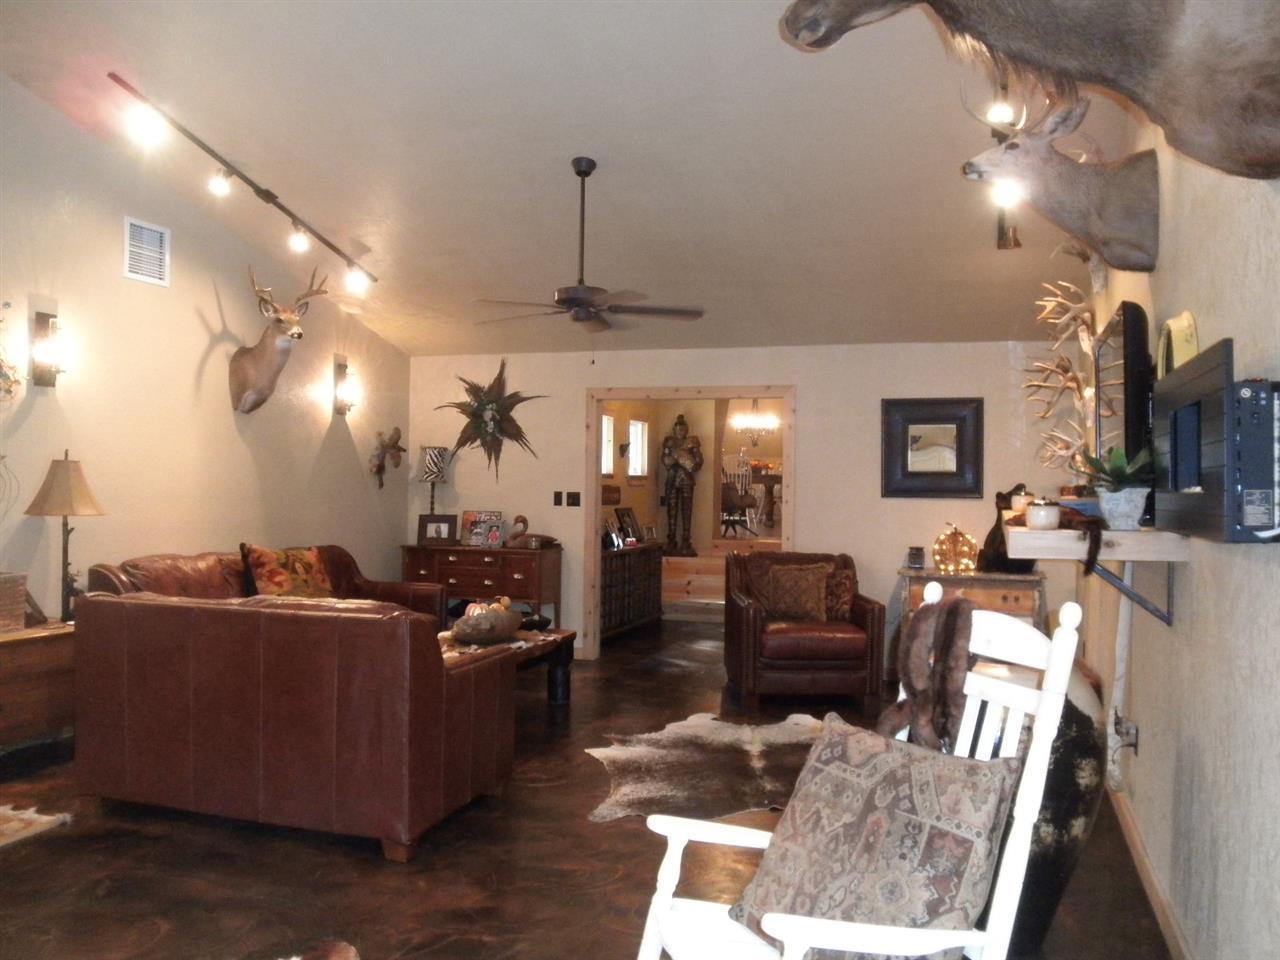 Sold Cross Sale W/ MLS | 54 Pike Lane  Ponca City, OK 74604 21